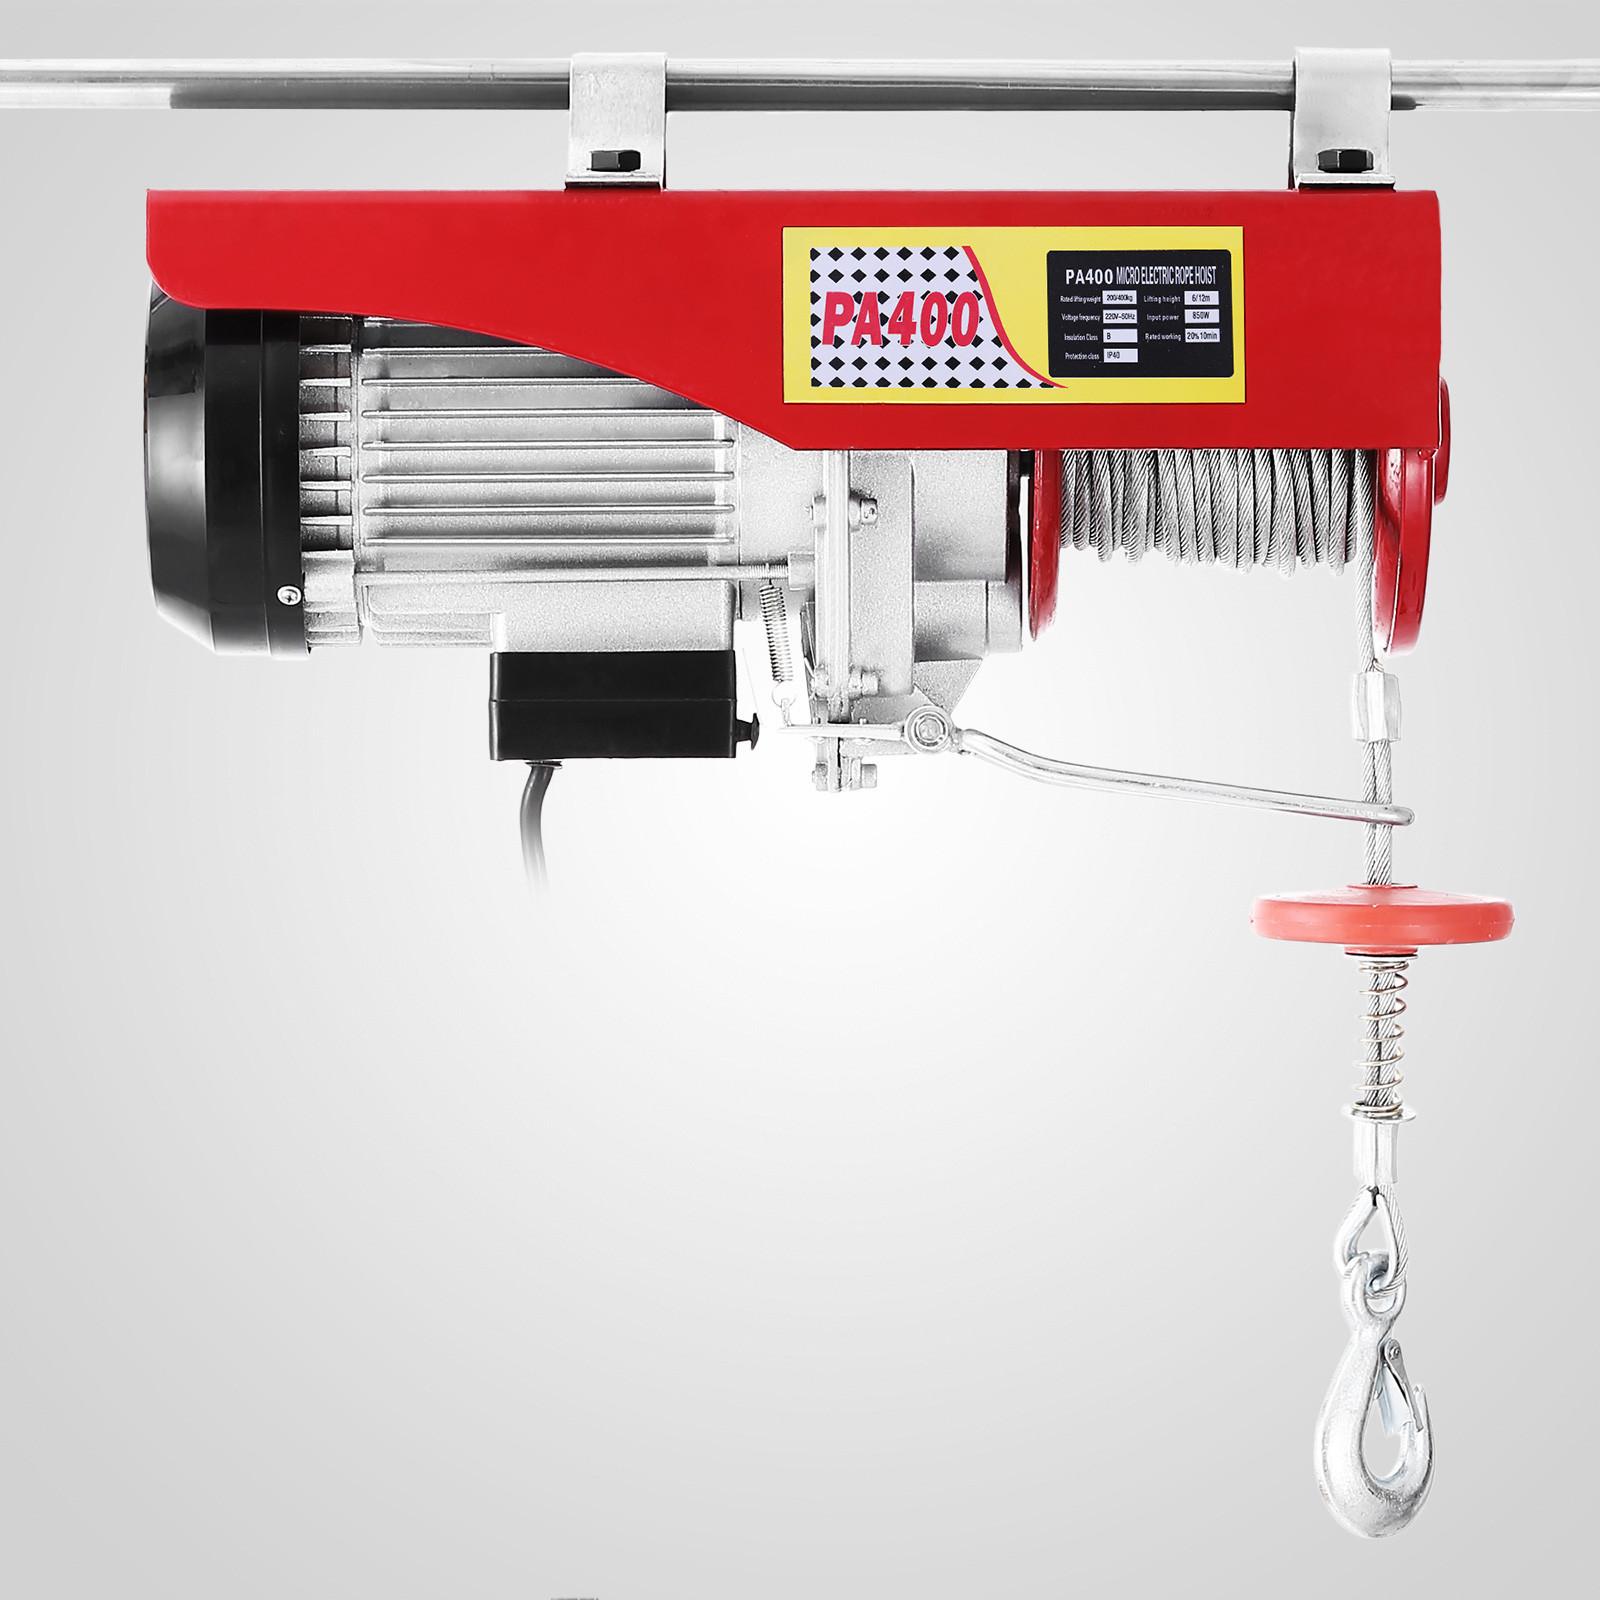 100kg-900kg-Electric-Hoist-Winch-Lifting-Engine-Crane-Cable-Lift-Hook-Garage miniature 28